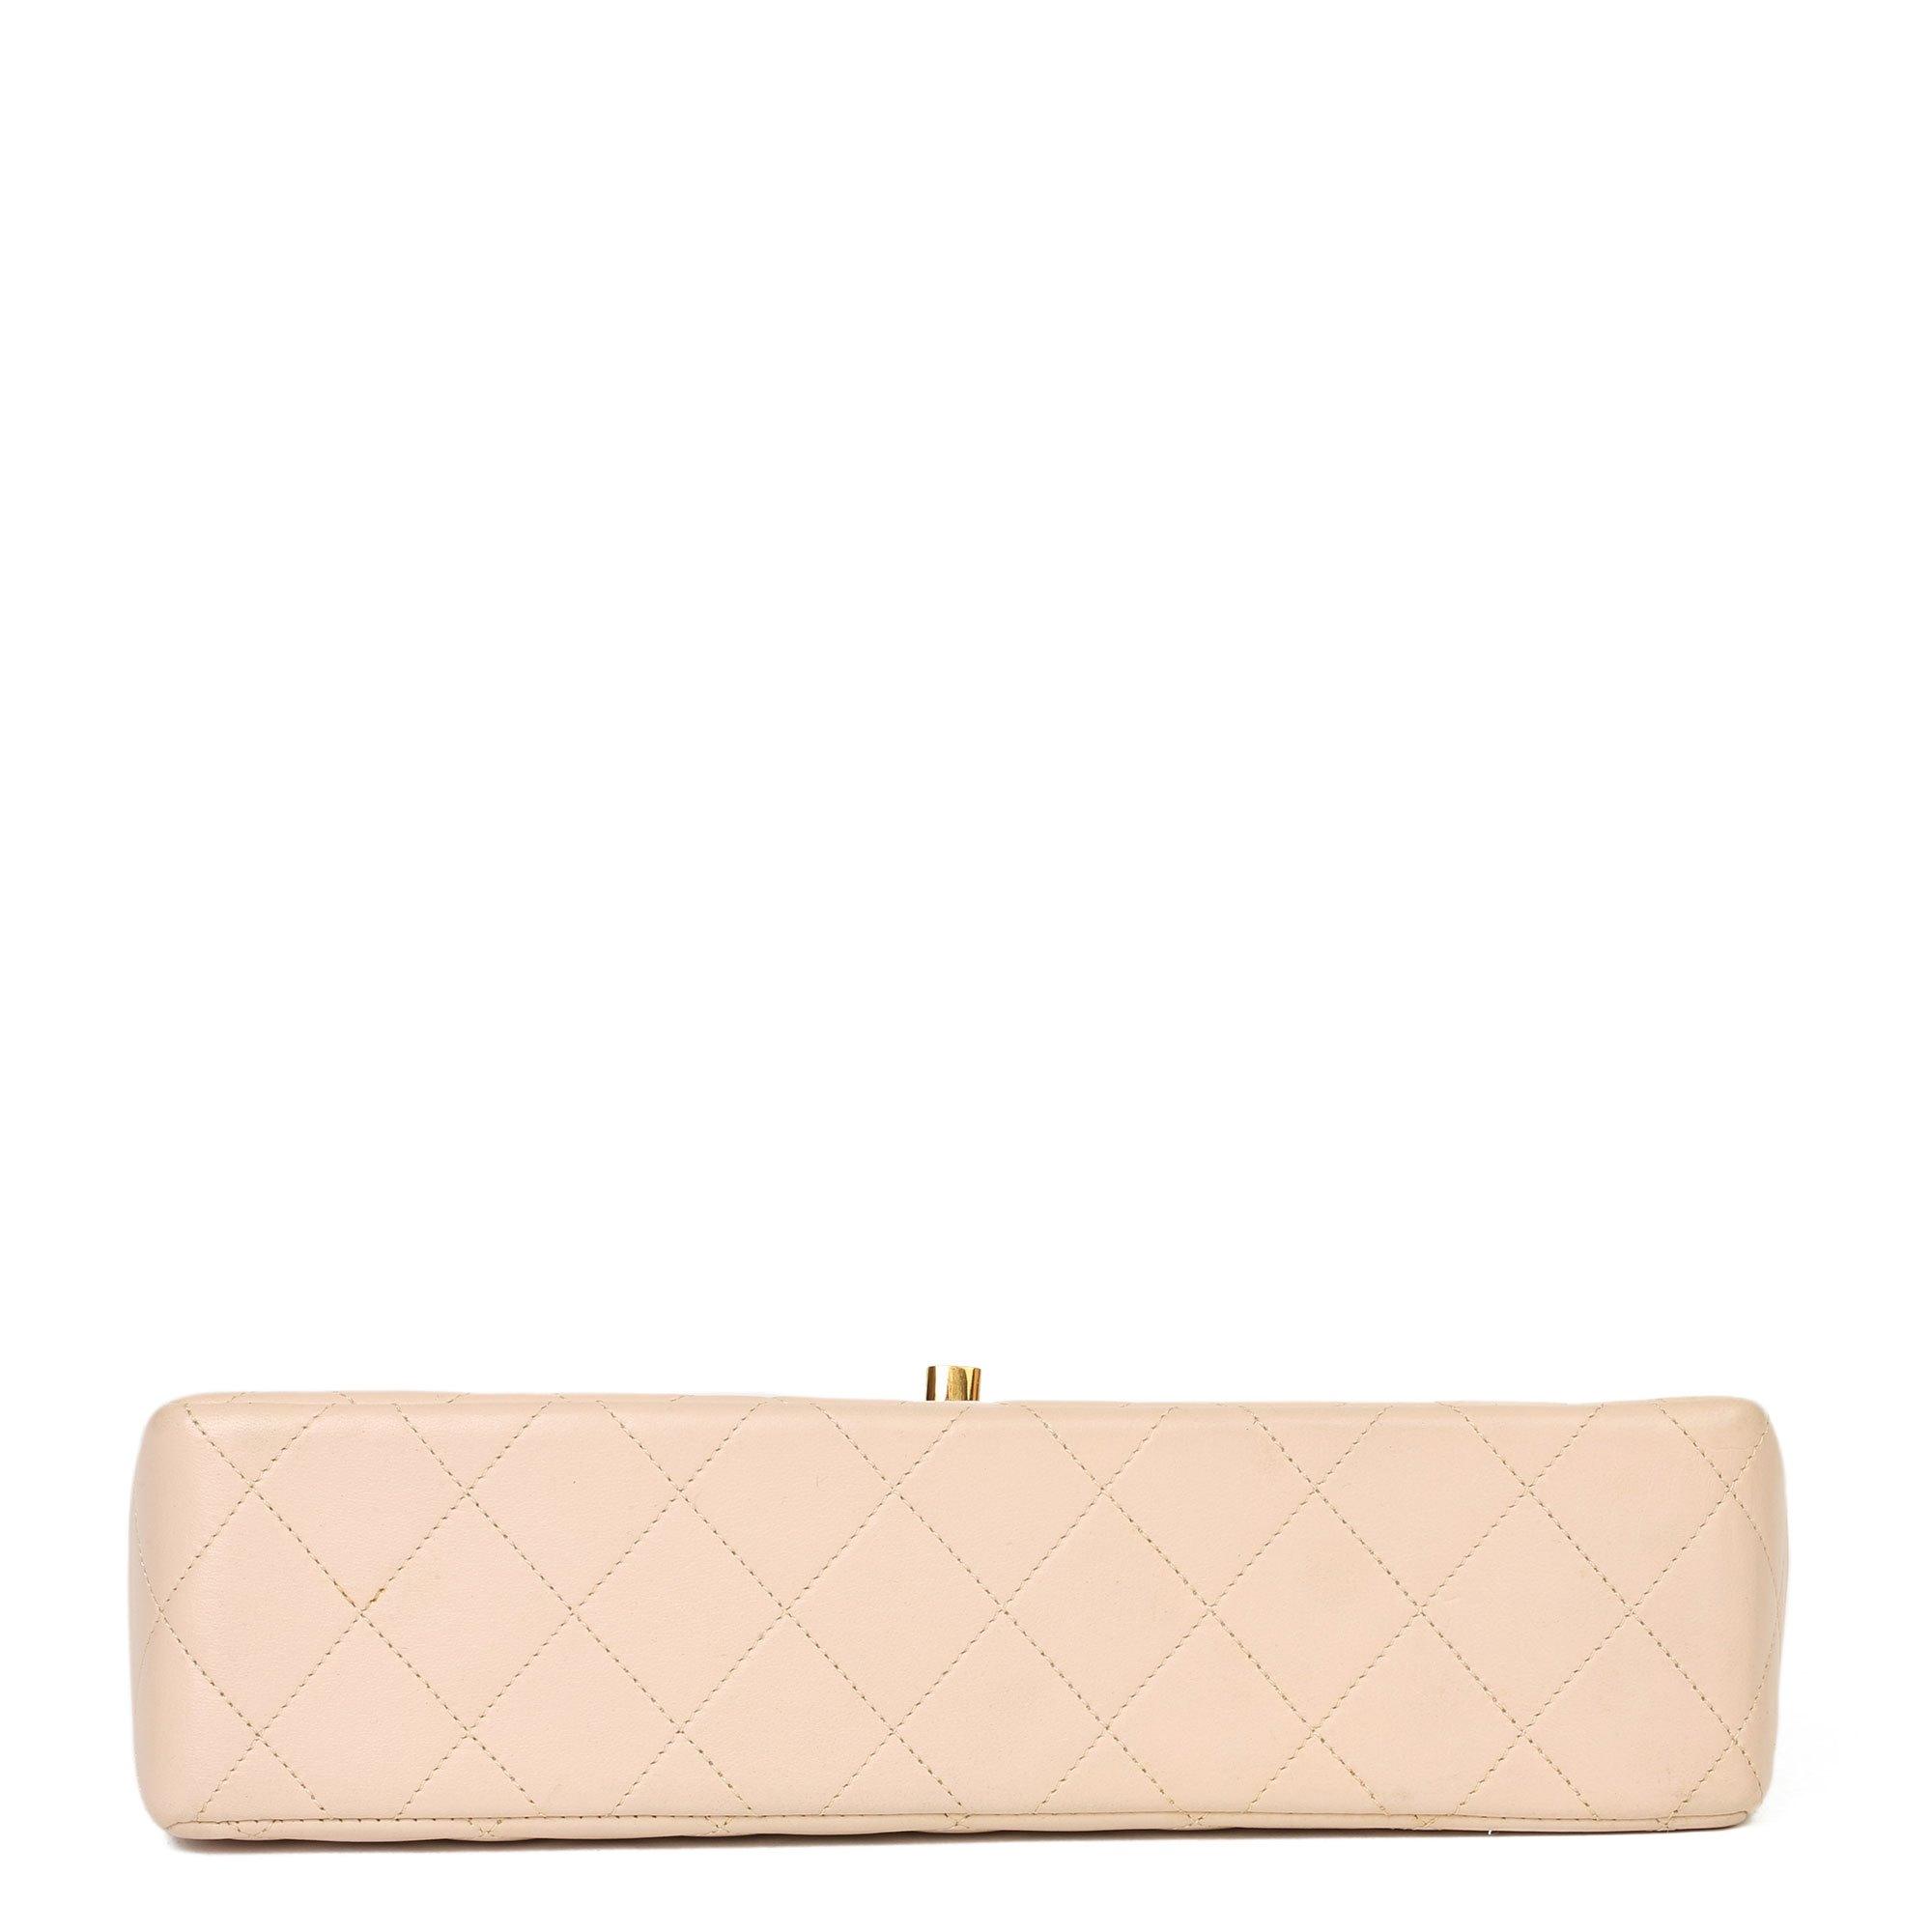 Chanel Beige Quilted Lambskin Vintage Medium Paris Limited Double Flap Bag